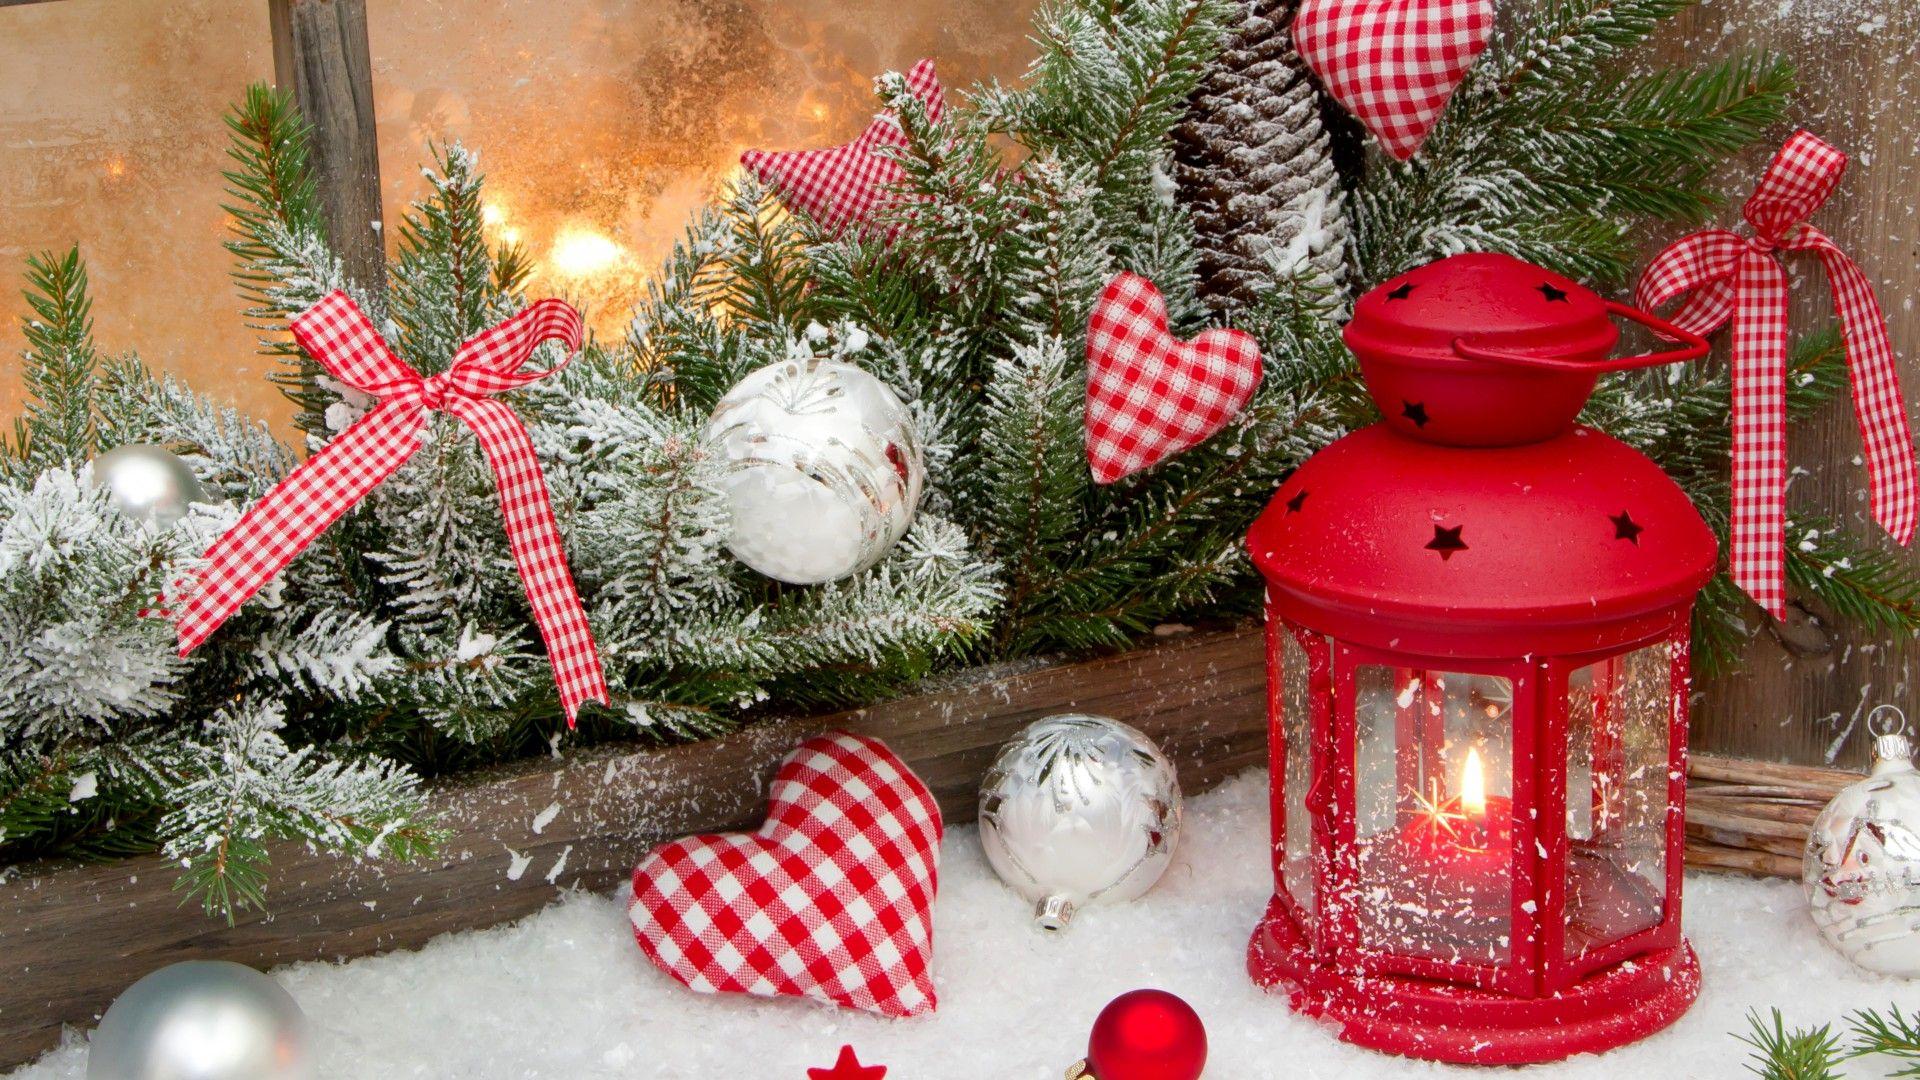 Christmas Decorations desktop wallpaper download